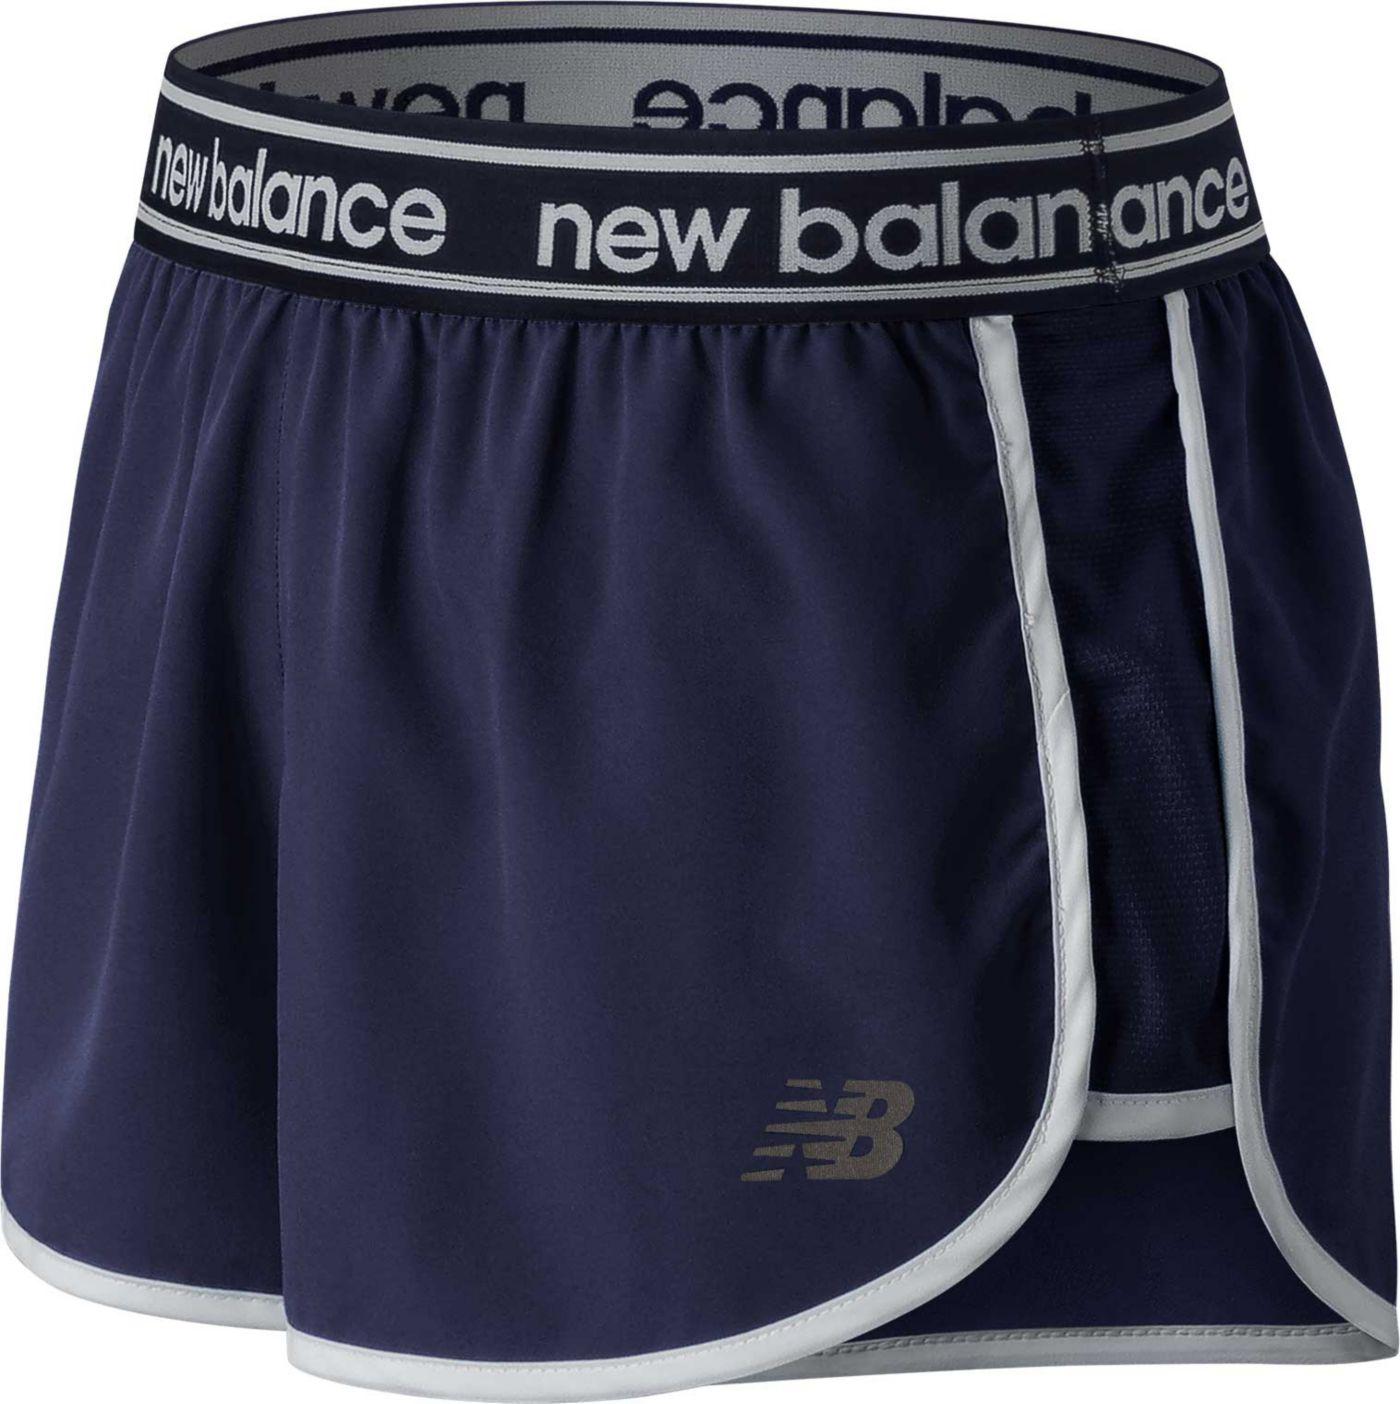 New Balance Women's Accelerate 2.5 In Short